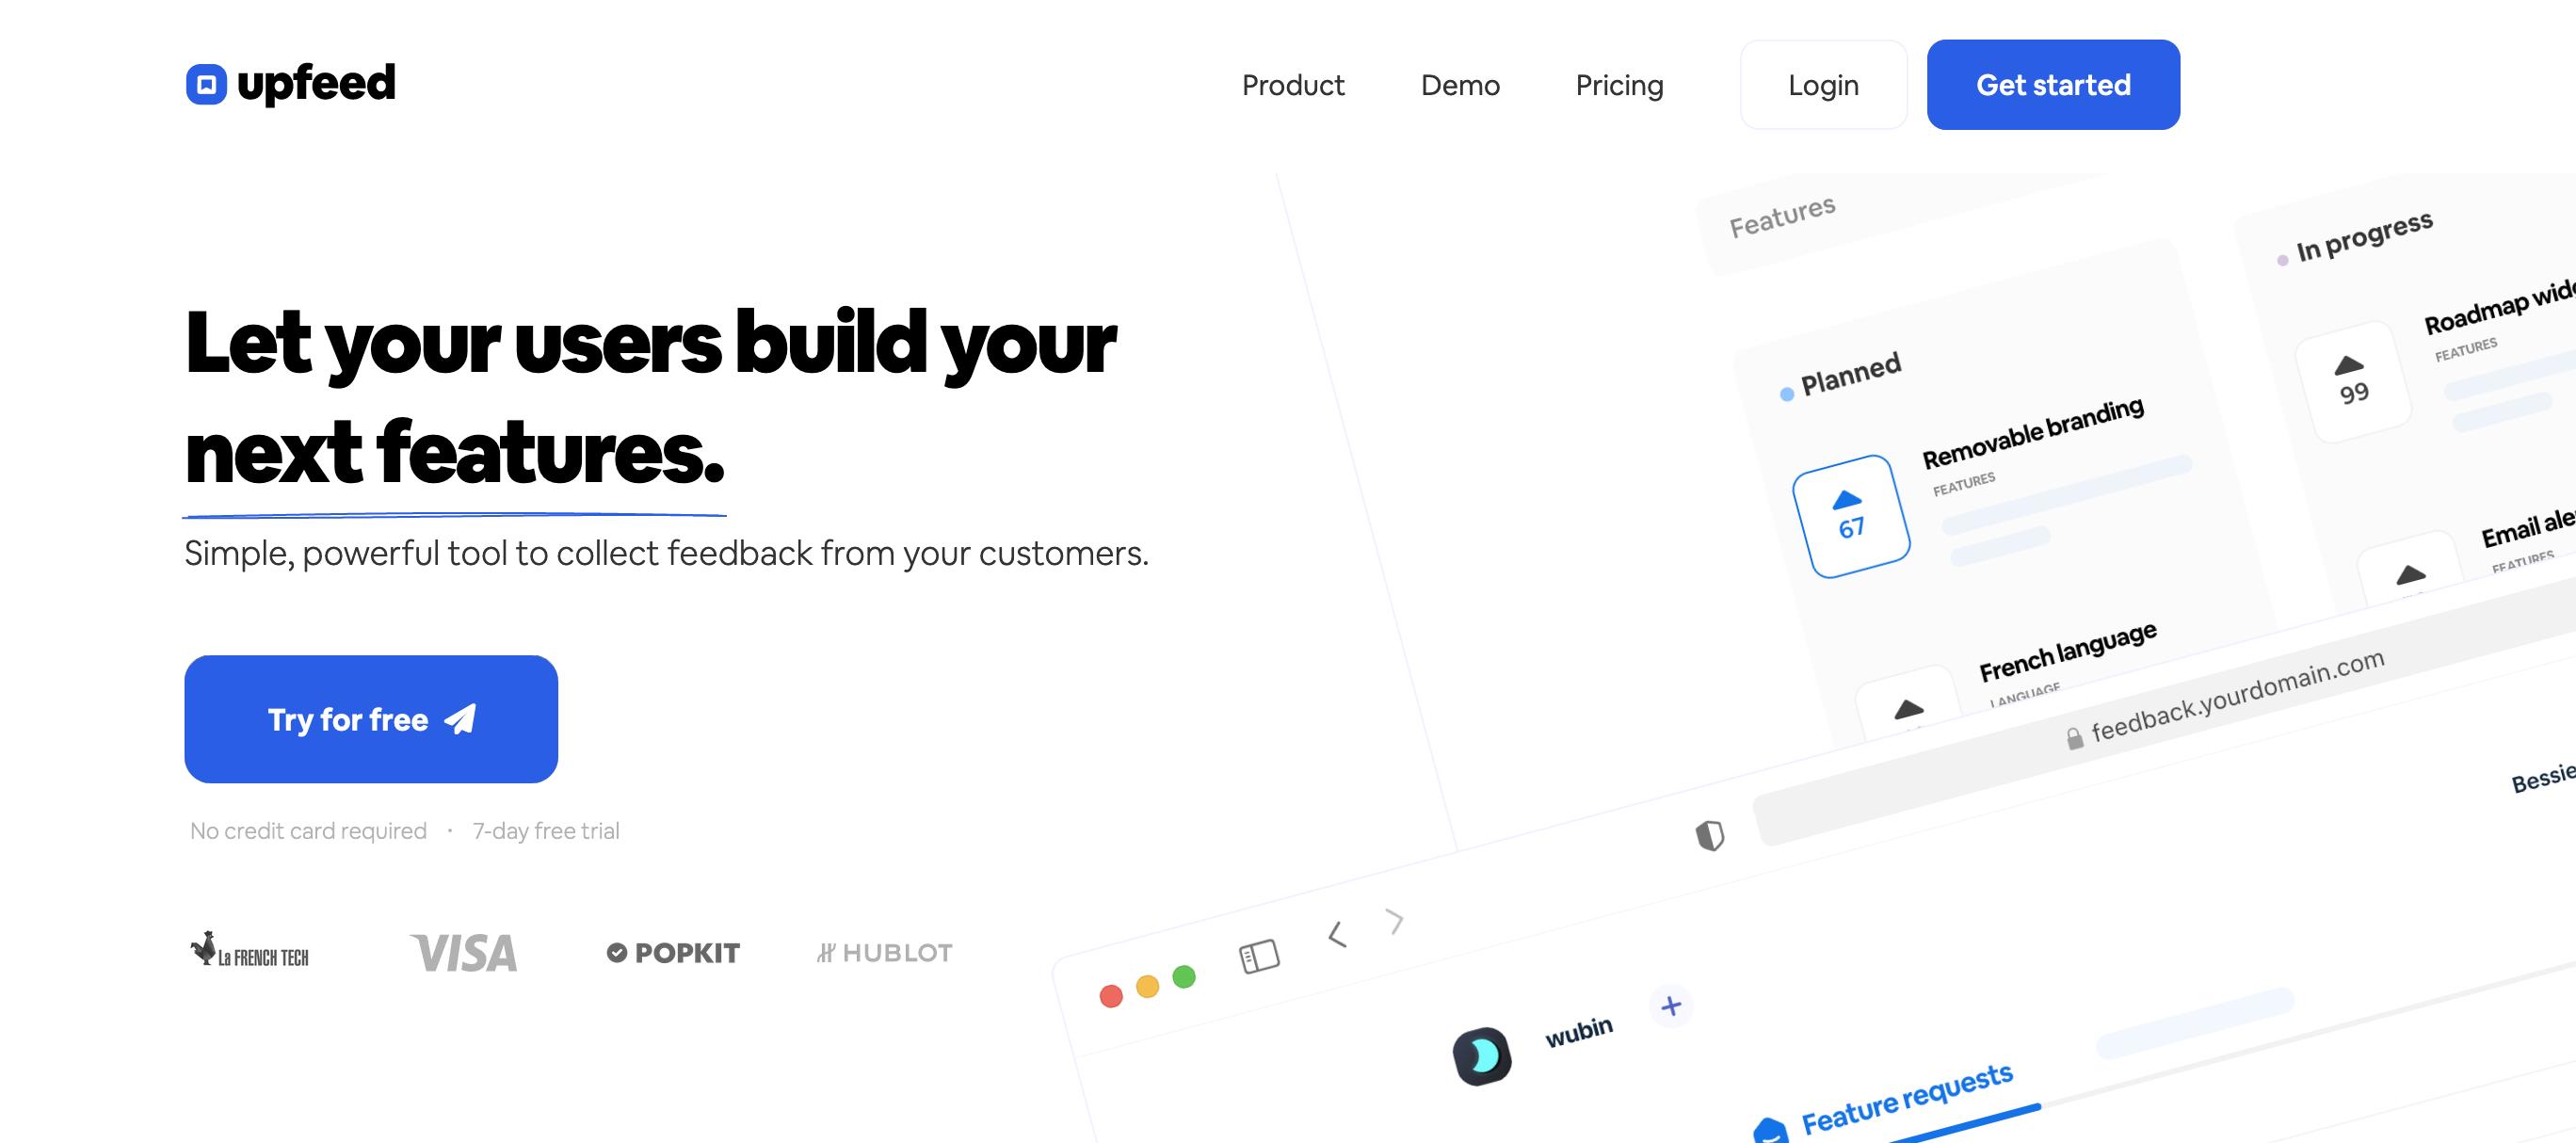 upfeed customer feedback feature-voting